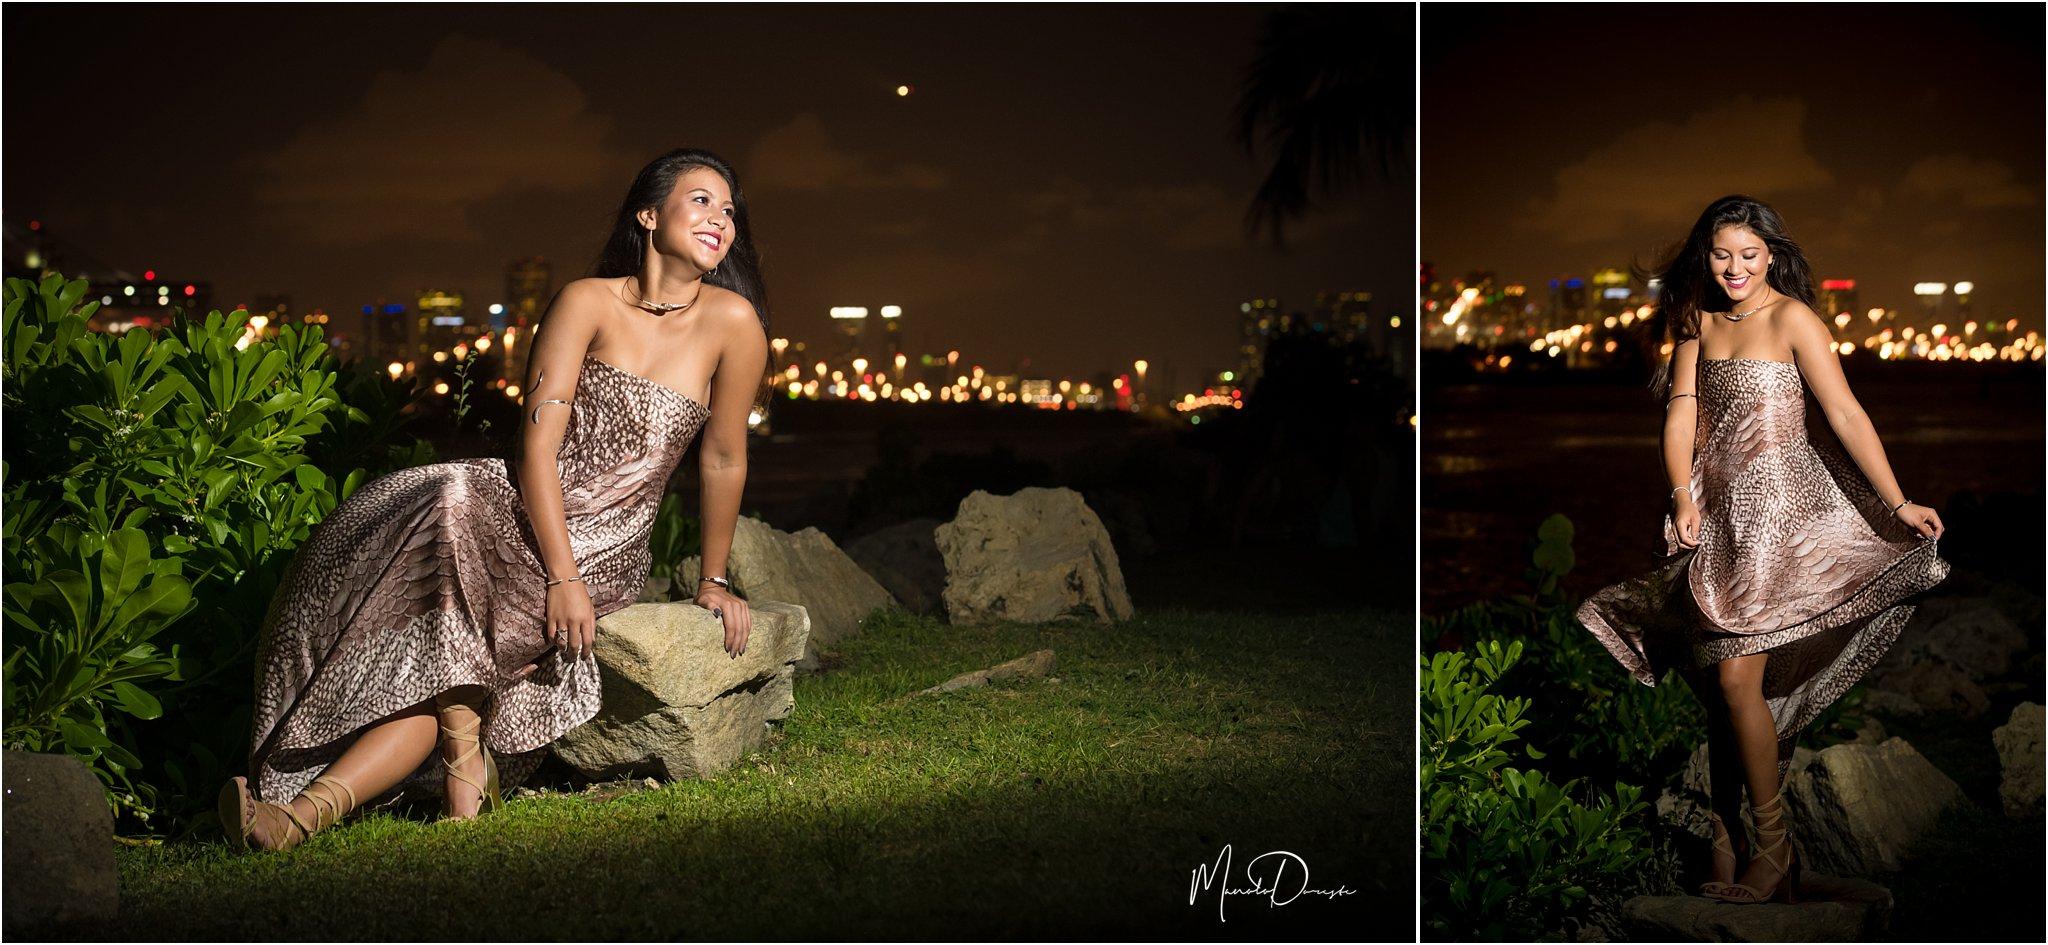 0248_ManoloDoreste_InFocusStudios_Wedding_Family_Photography_Miami_MiamiPhotographer.jpg